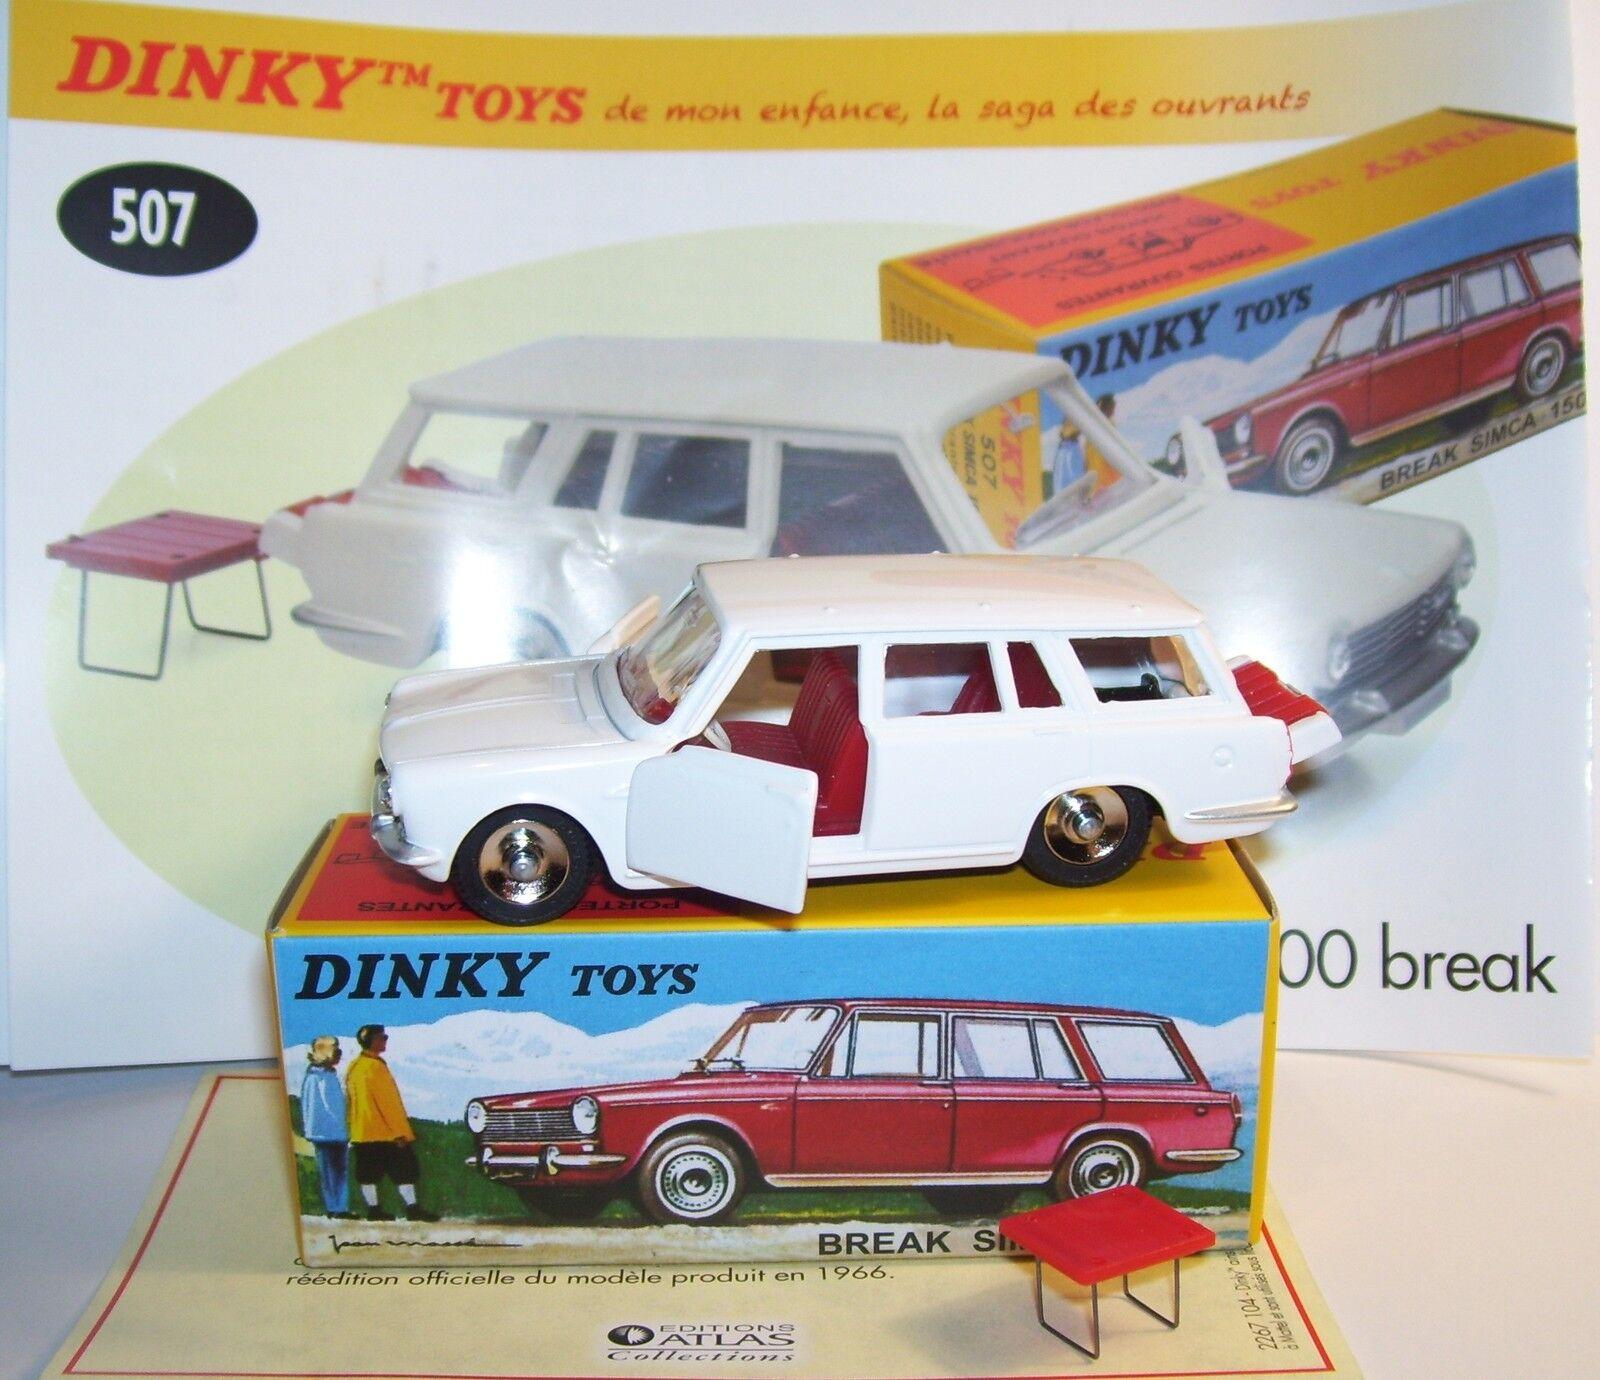 DINKY TOYS ATLAS SIMCA 1500 BREAK REF 507 BOX portes tronco las aperturas EN Box